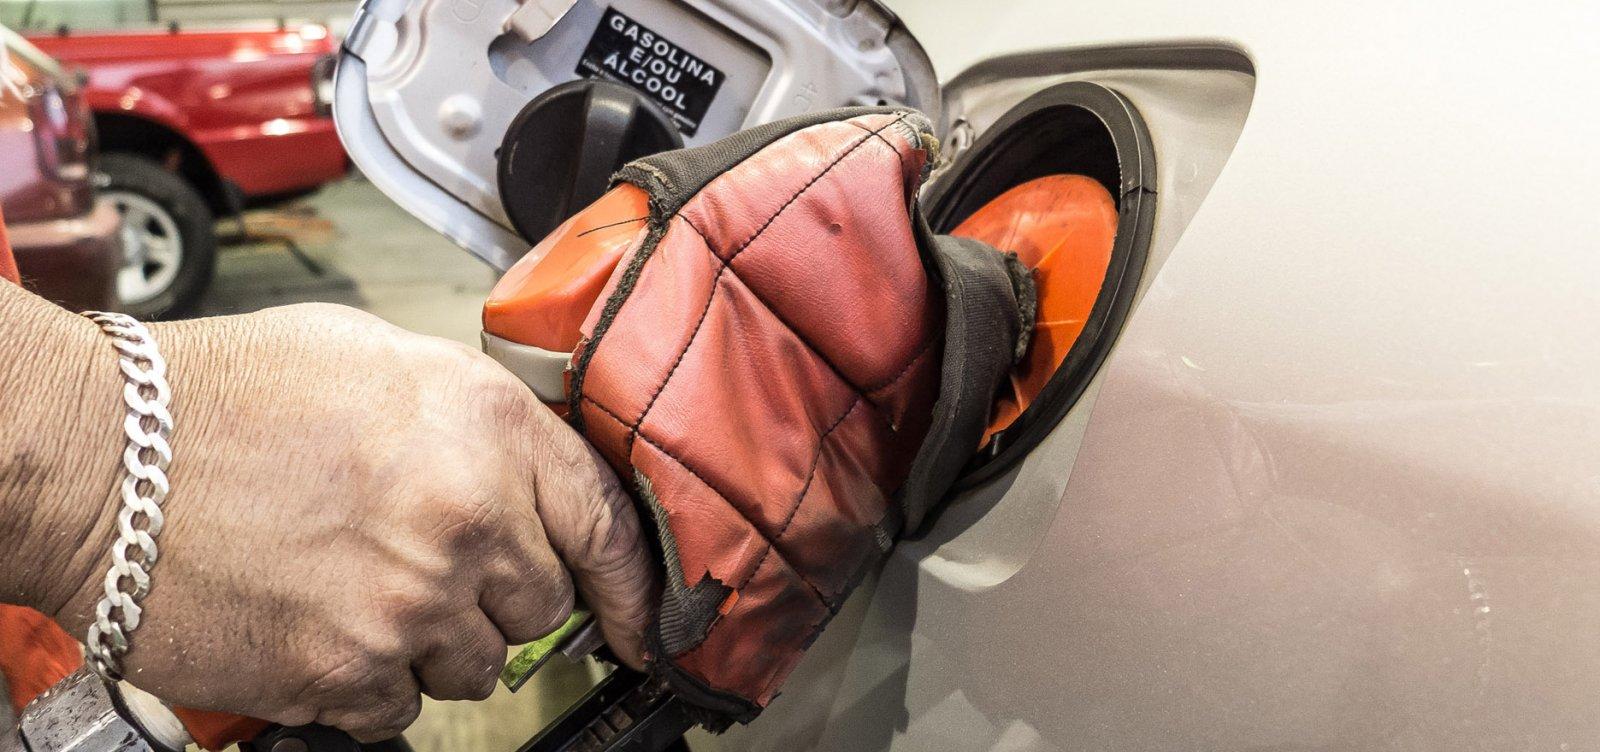 Brasil terá nova gasolina a partir de agosto